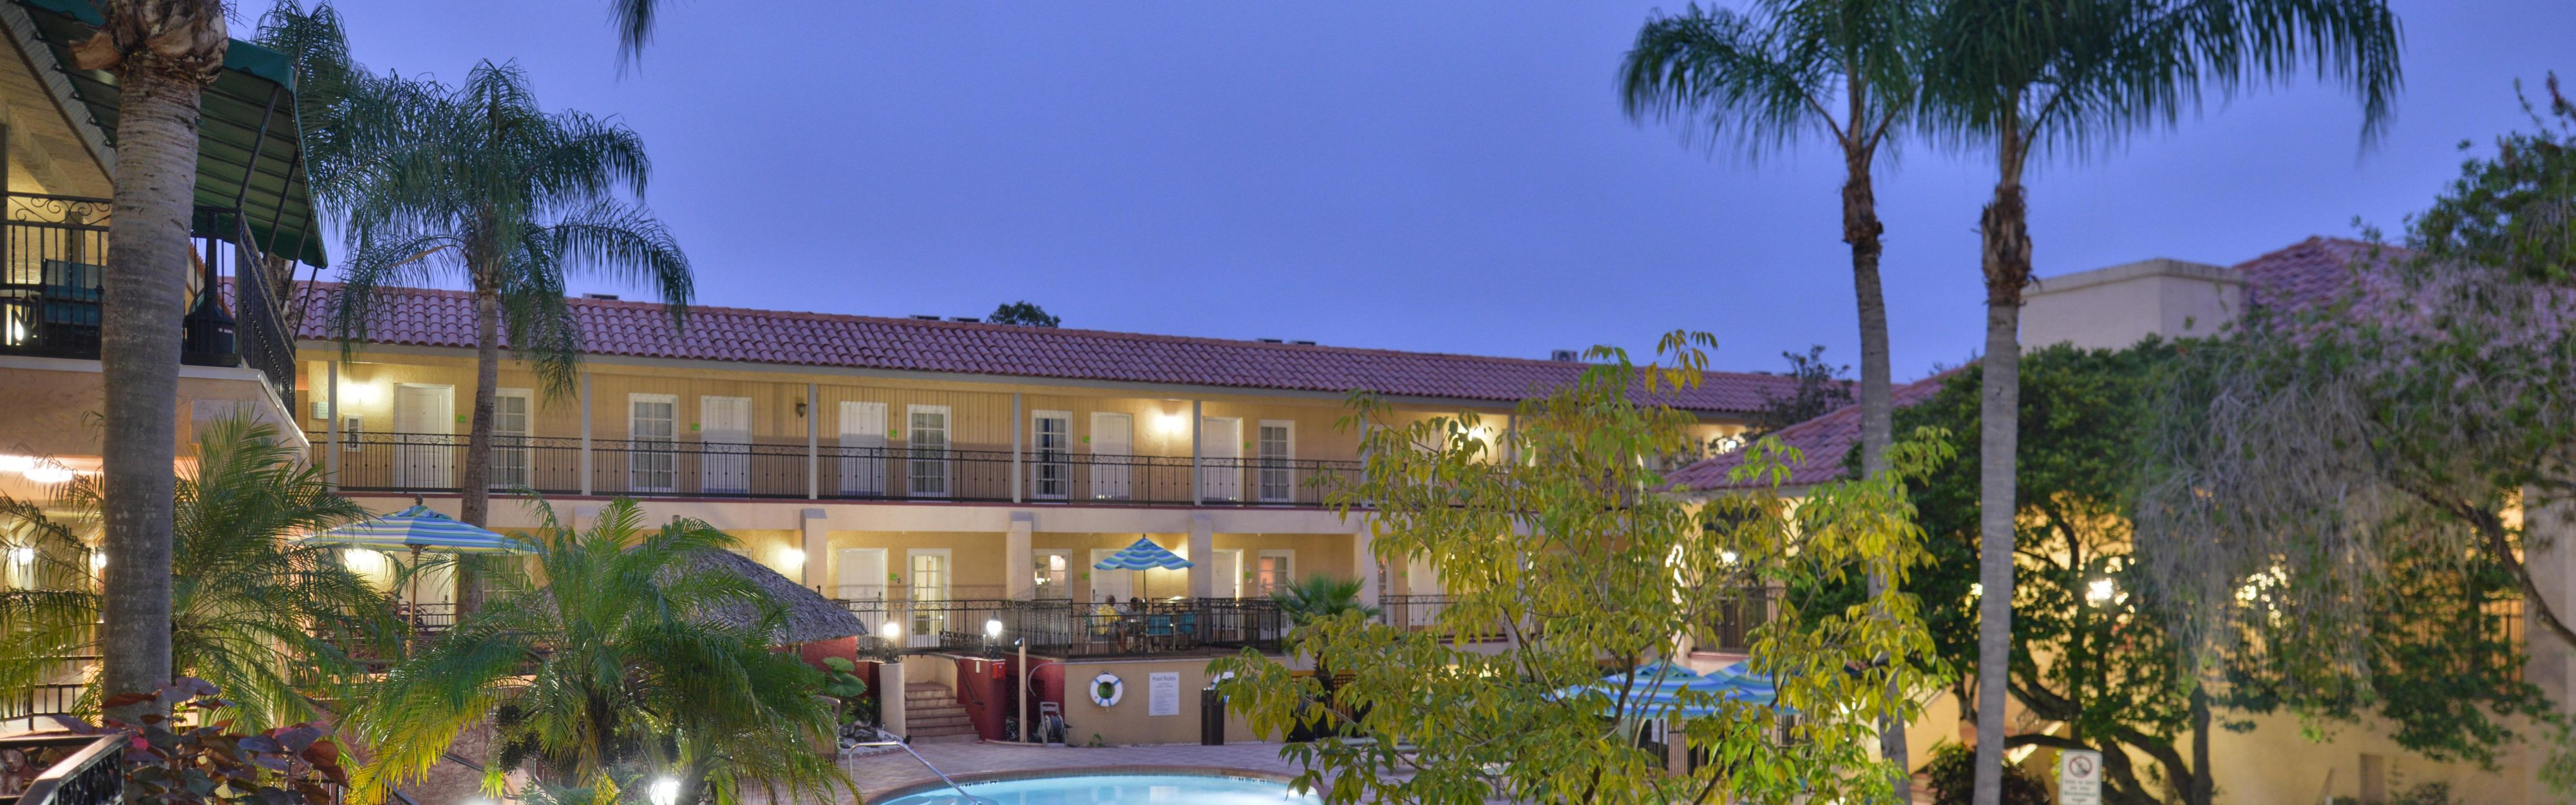 Holiday Inn Tampa N Busch Gardens Area Tampa Florida Fl